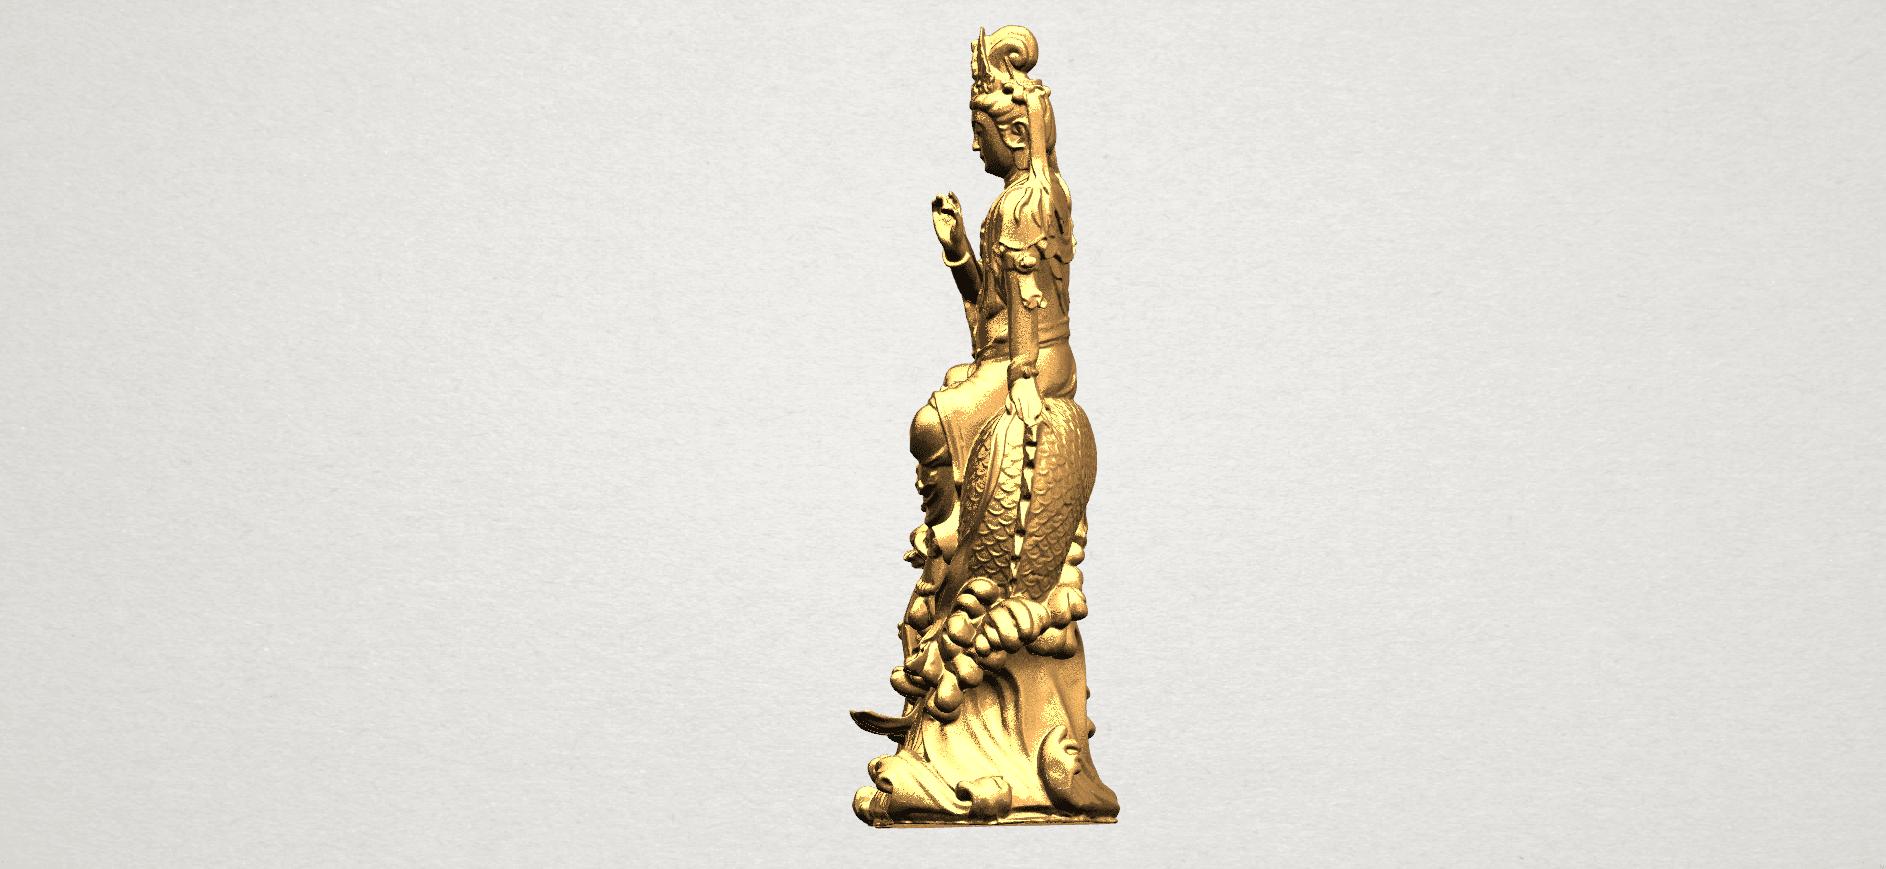 Avalokitesvara Bodhisattva (with fish) 88mm - A03.png Télécharger fichier 3DS gratuit Avalokitesvara Bodhisattva (avec poisson) 01 • Modèle imprimable en 3D, GeorgesNikkei